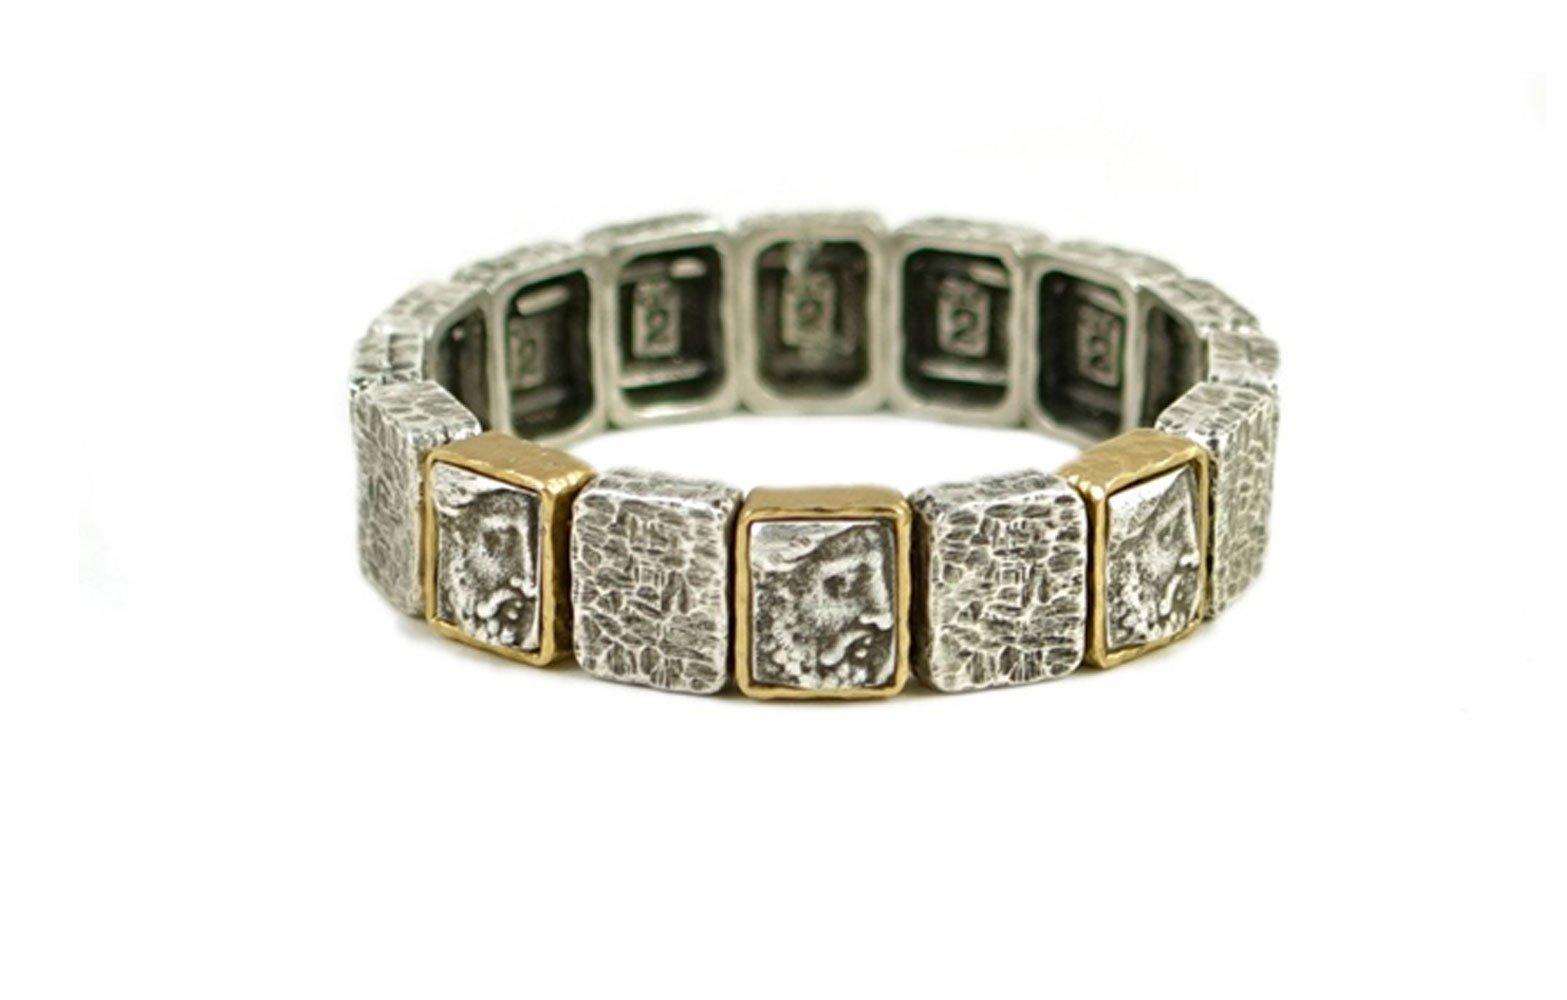 Tat2 Designs Women's Vintage Silver Plated Cloch Roman Man Bracelet